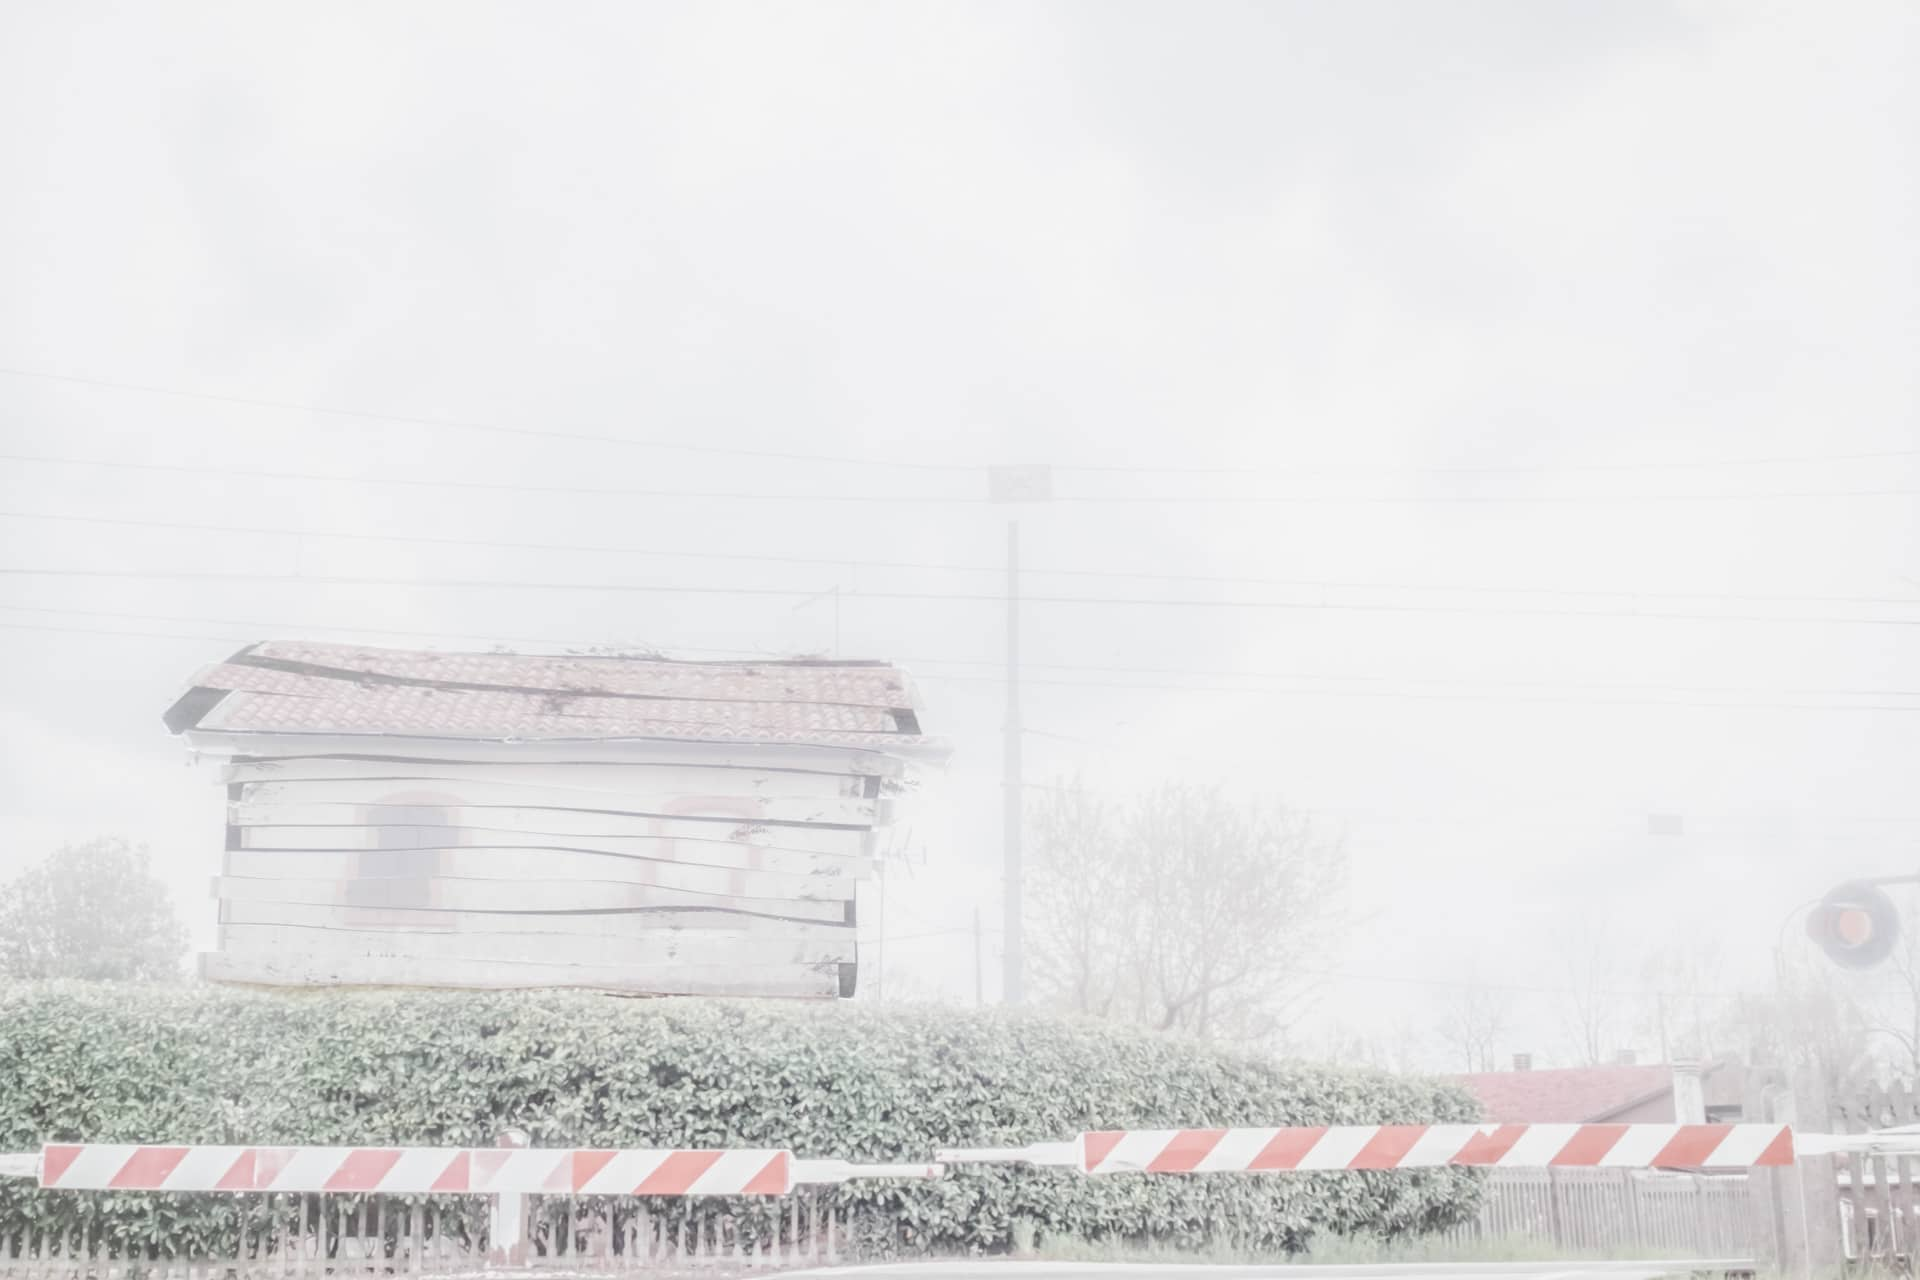 Fog-and-memories-3